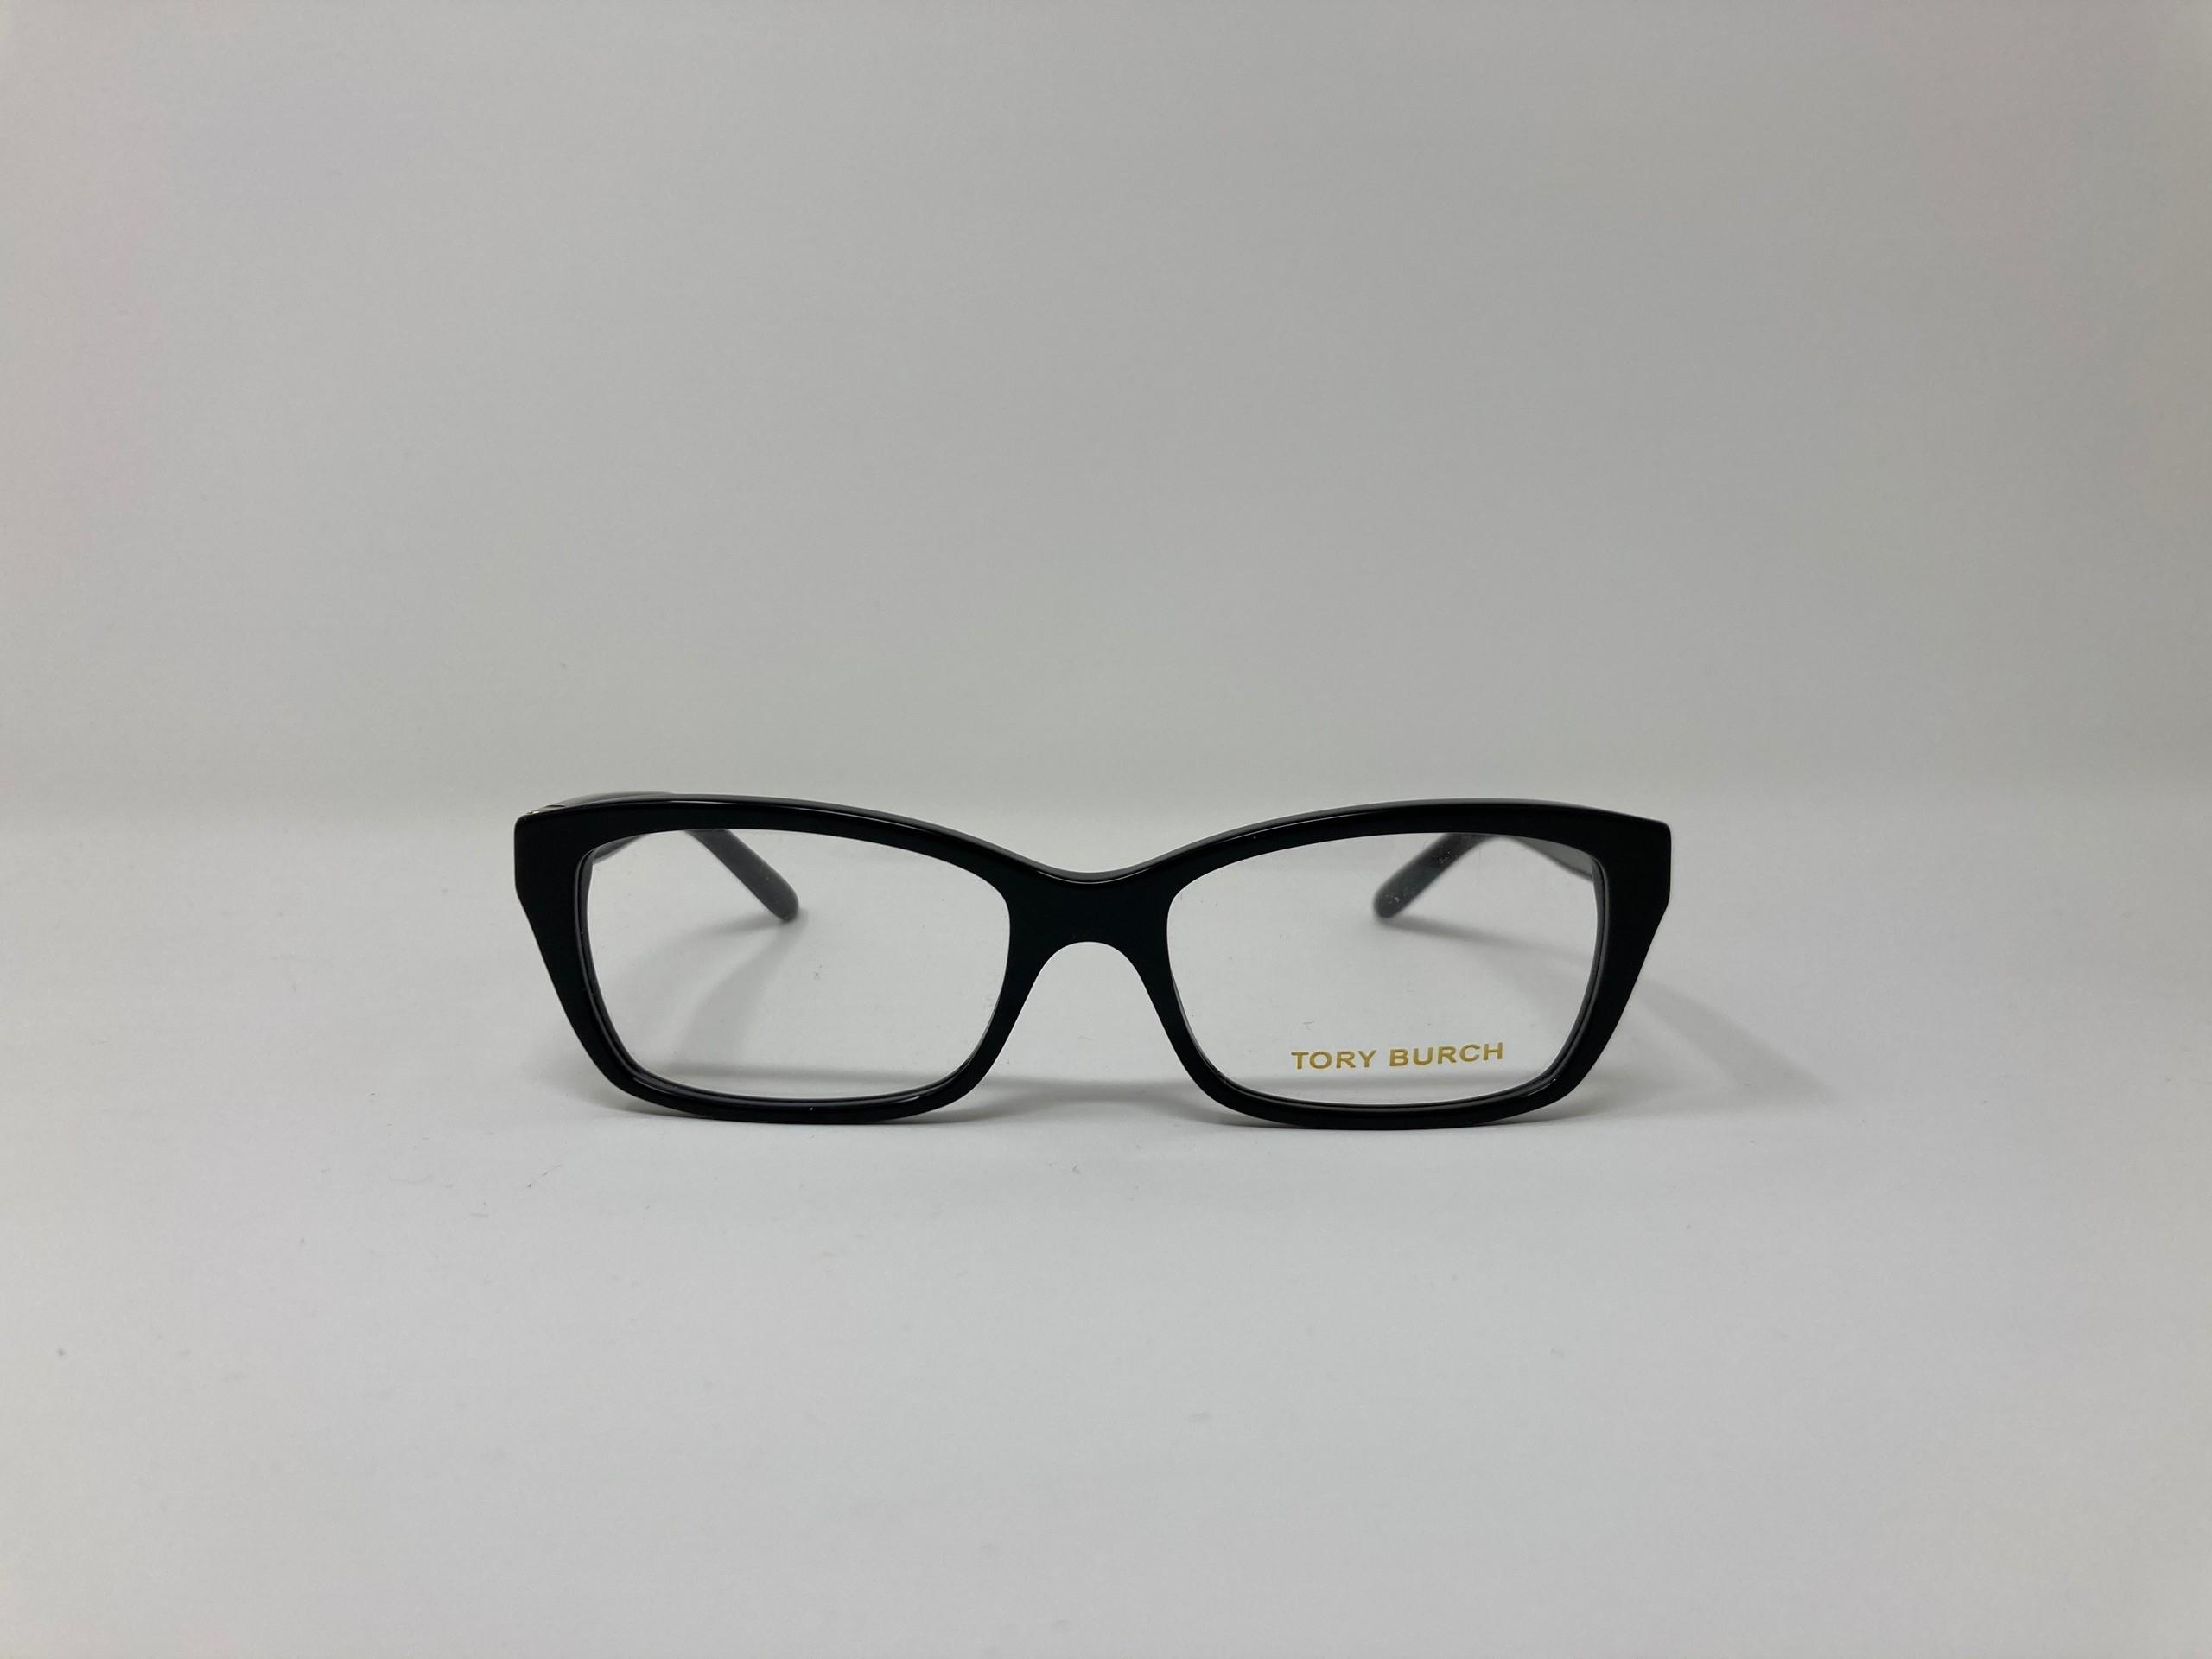 Tory Burch TY 2049 Women's eyeglasses